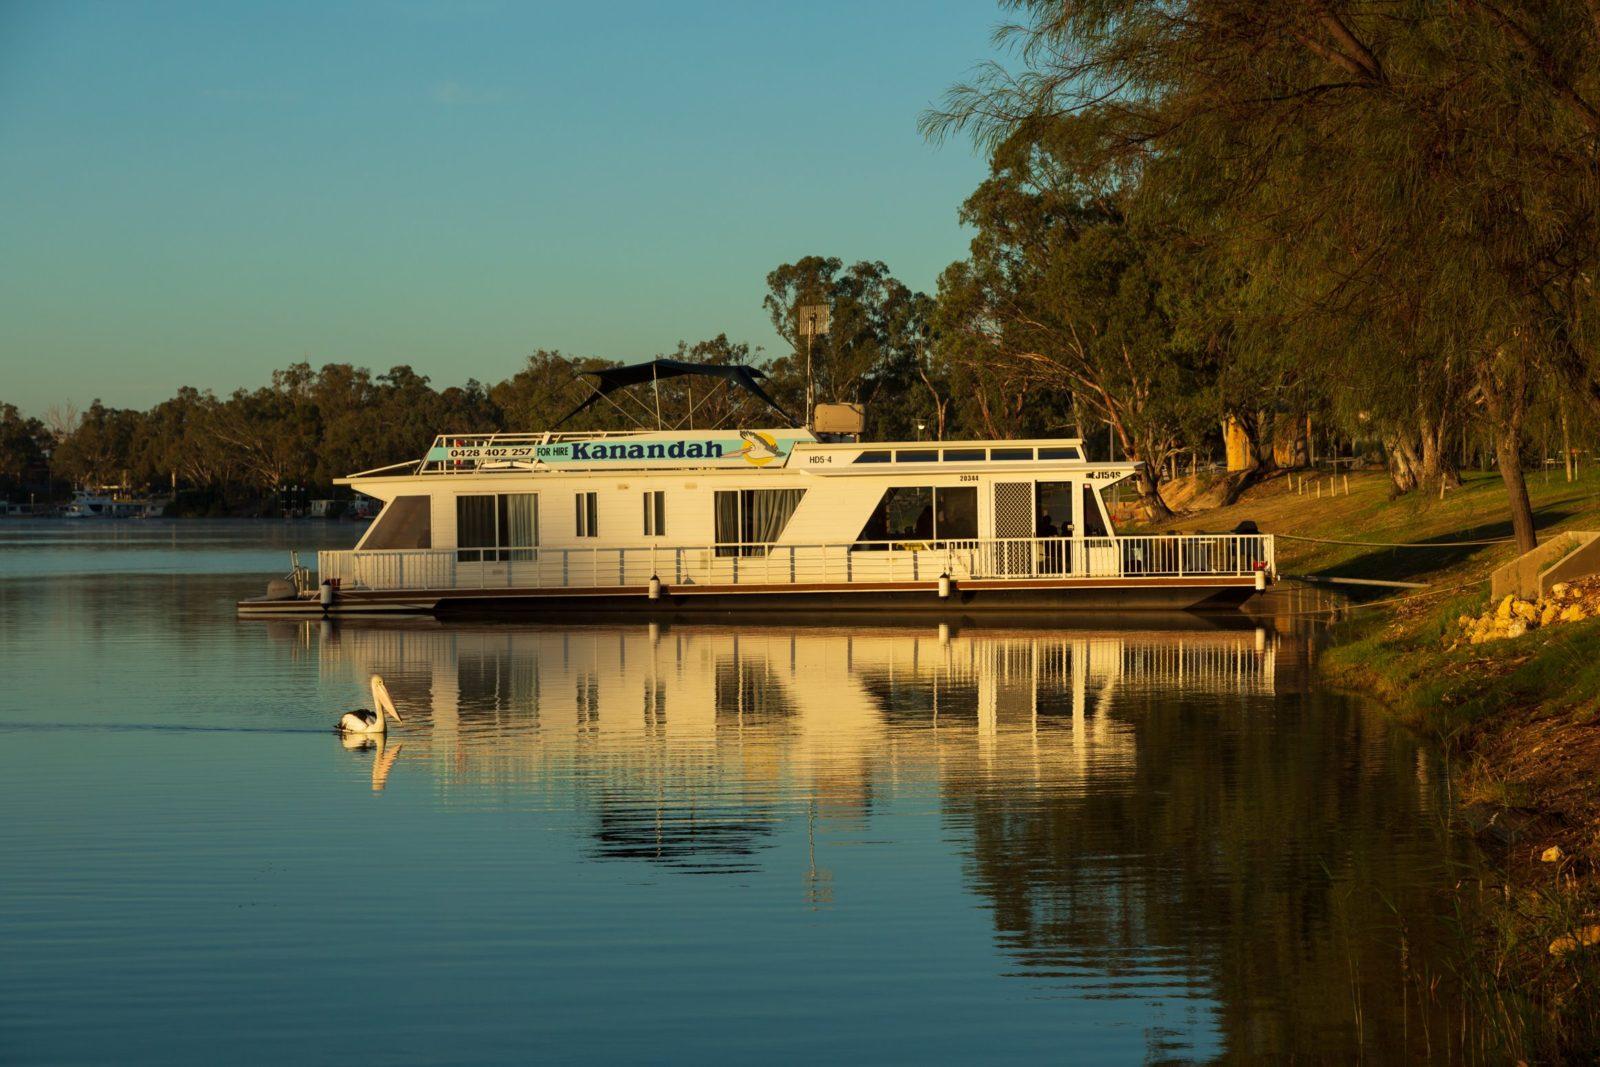 Kanandah houseboat